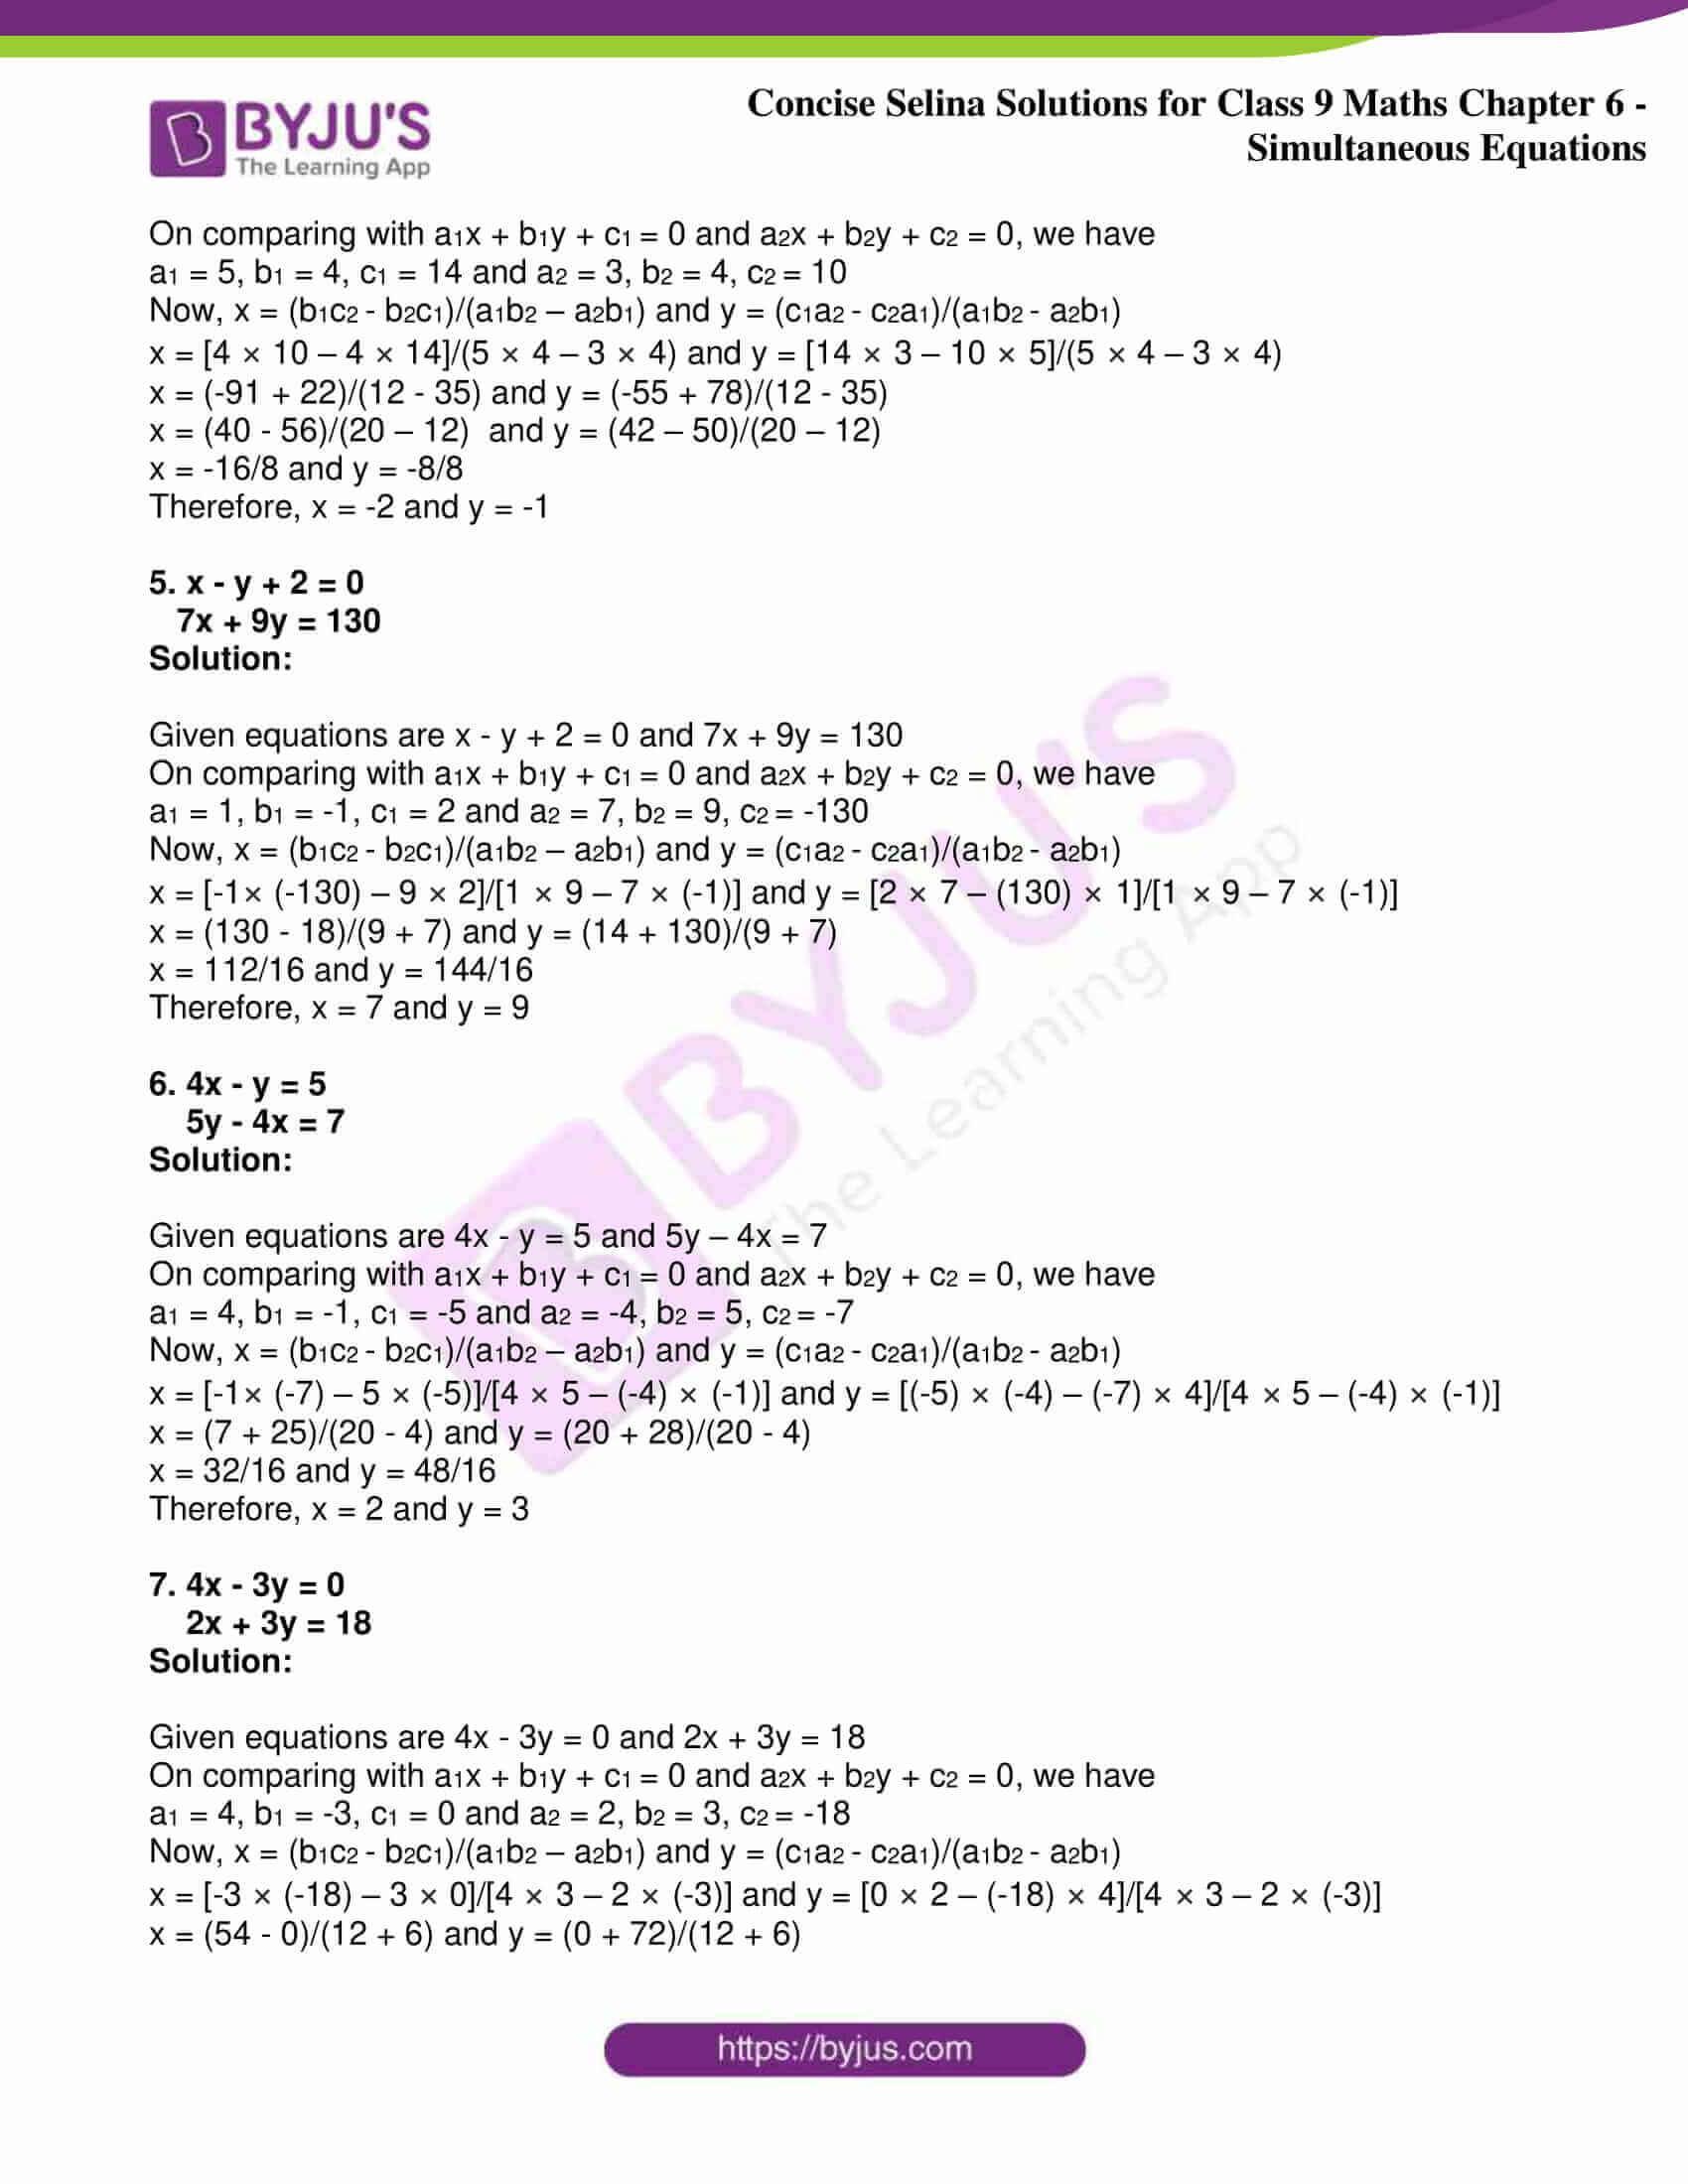 icse class 9 jun7 maths selina solutions chapter 6 simultaneous equations 21